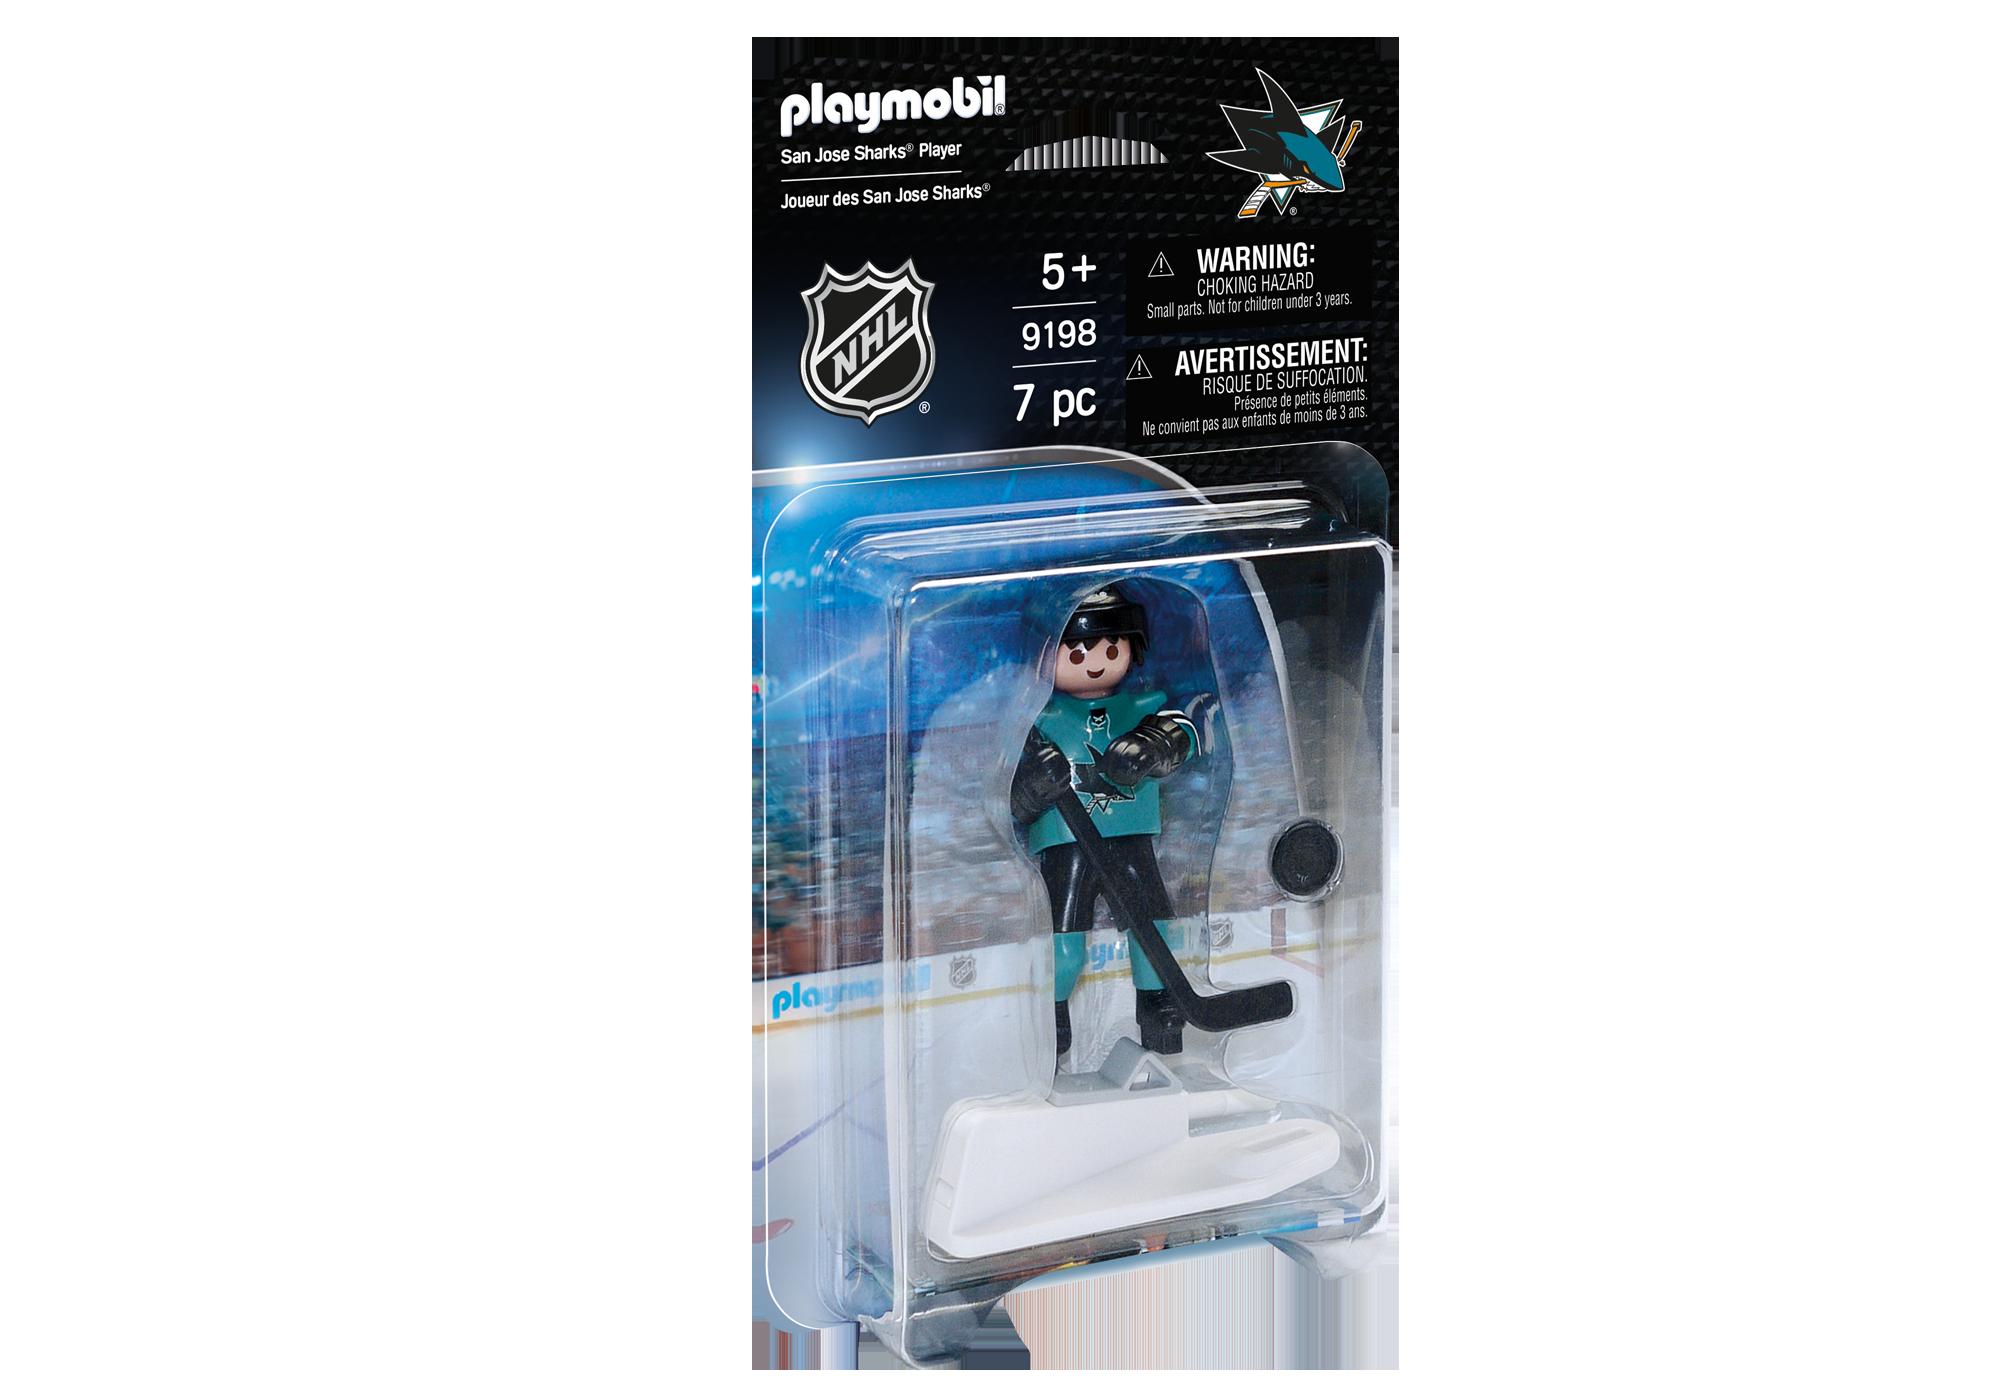 http://media.playmobil.com/i/playmobil/9198_product_box_front/NHL® San Jose Sharks® Player